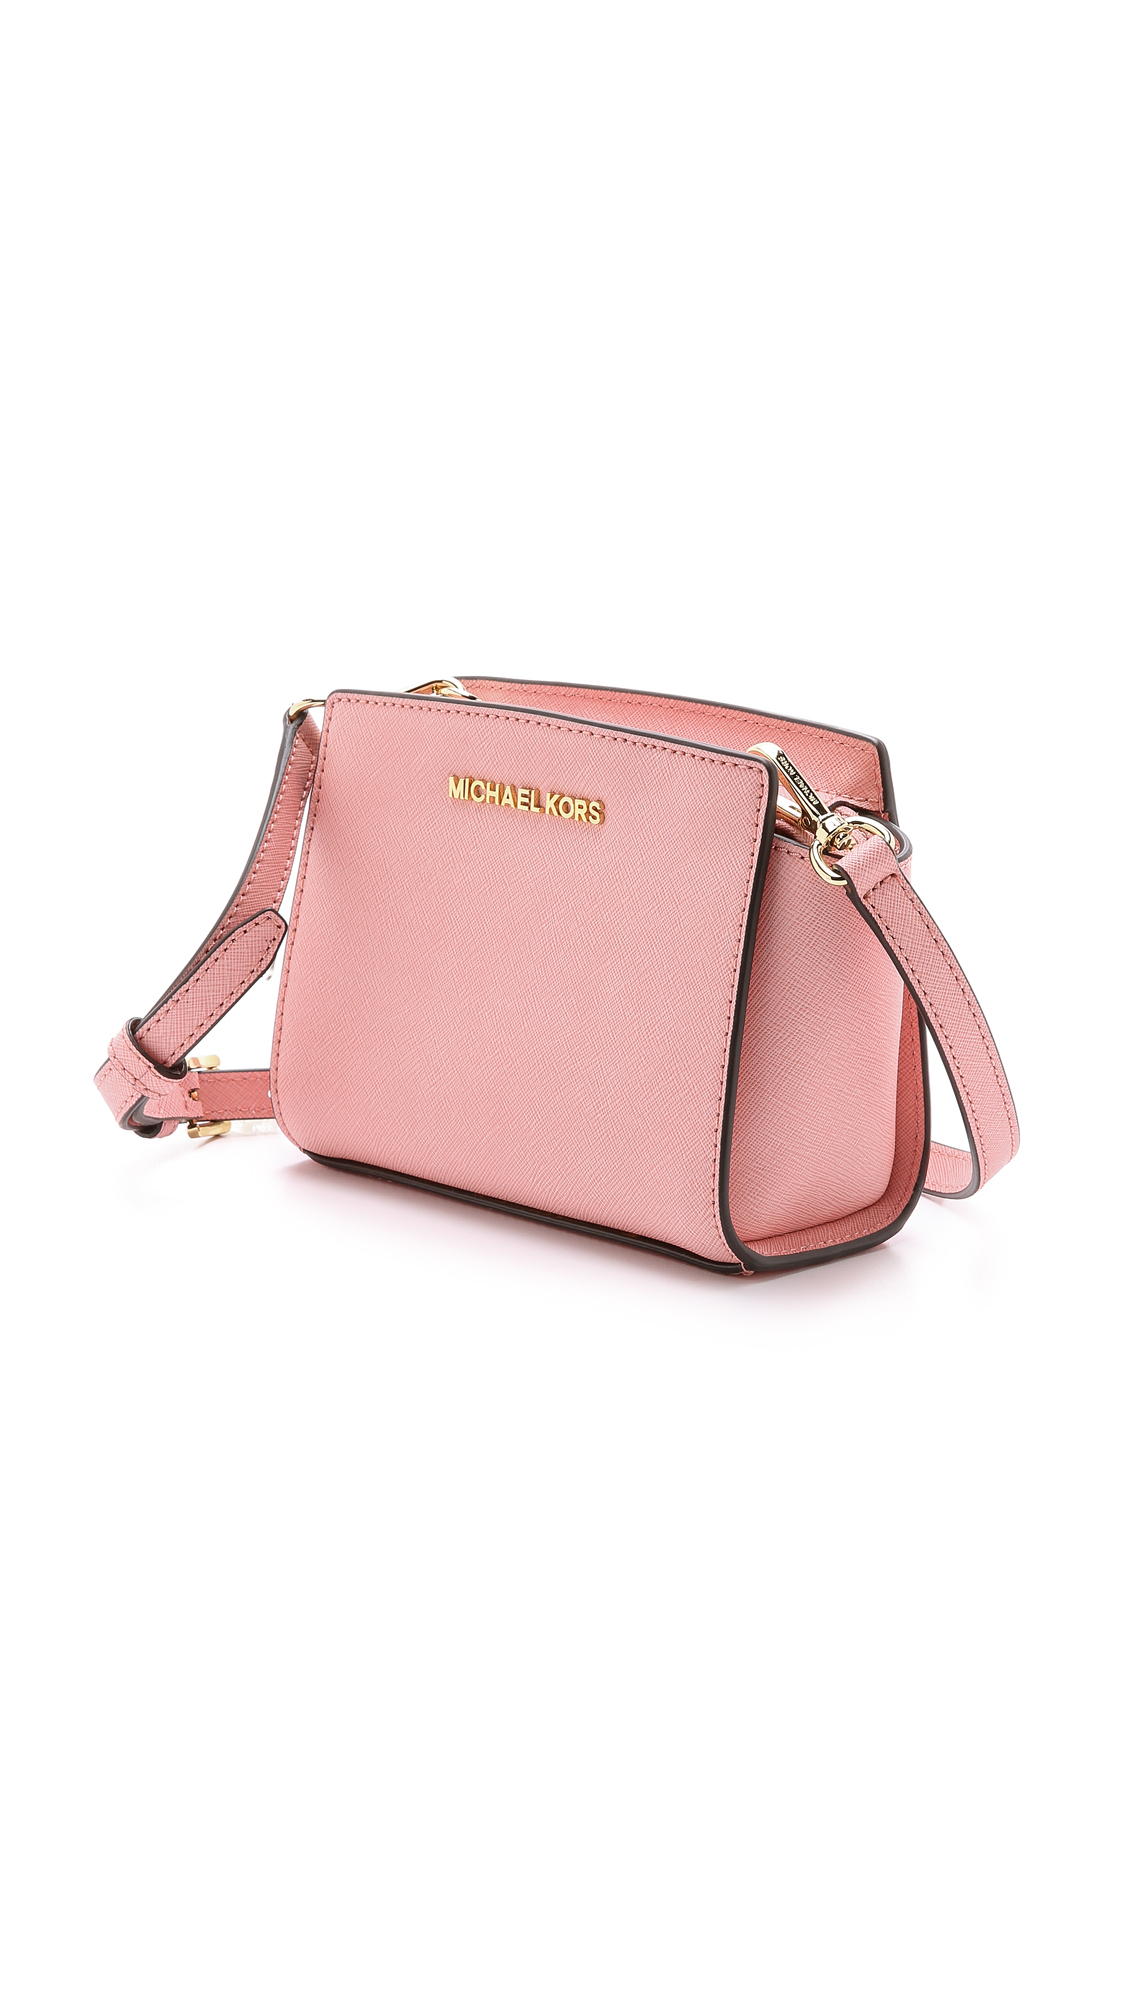 ac83a4f4d2 Lyst - MICHAEL Michael Kors Selma Mini Messenger Bag - Pale Pink in Pink